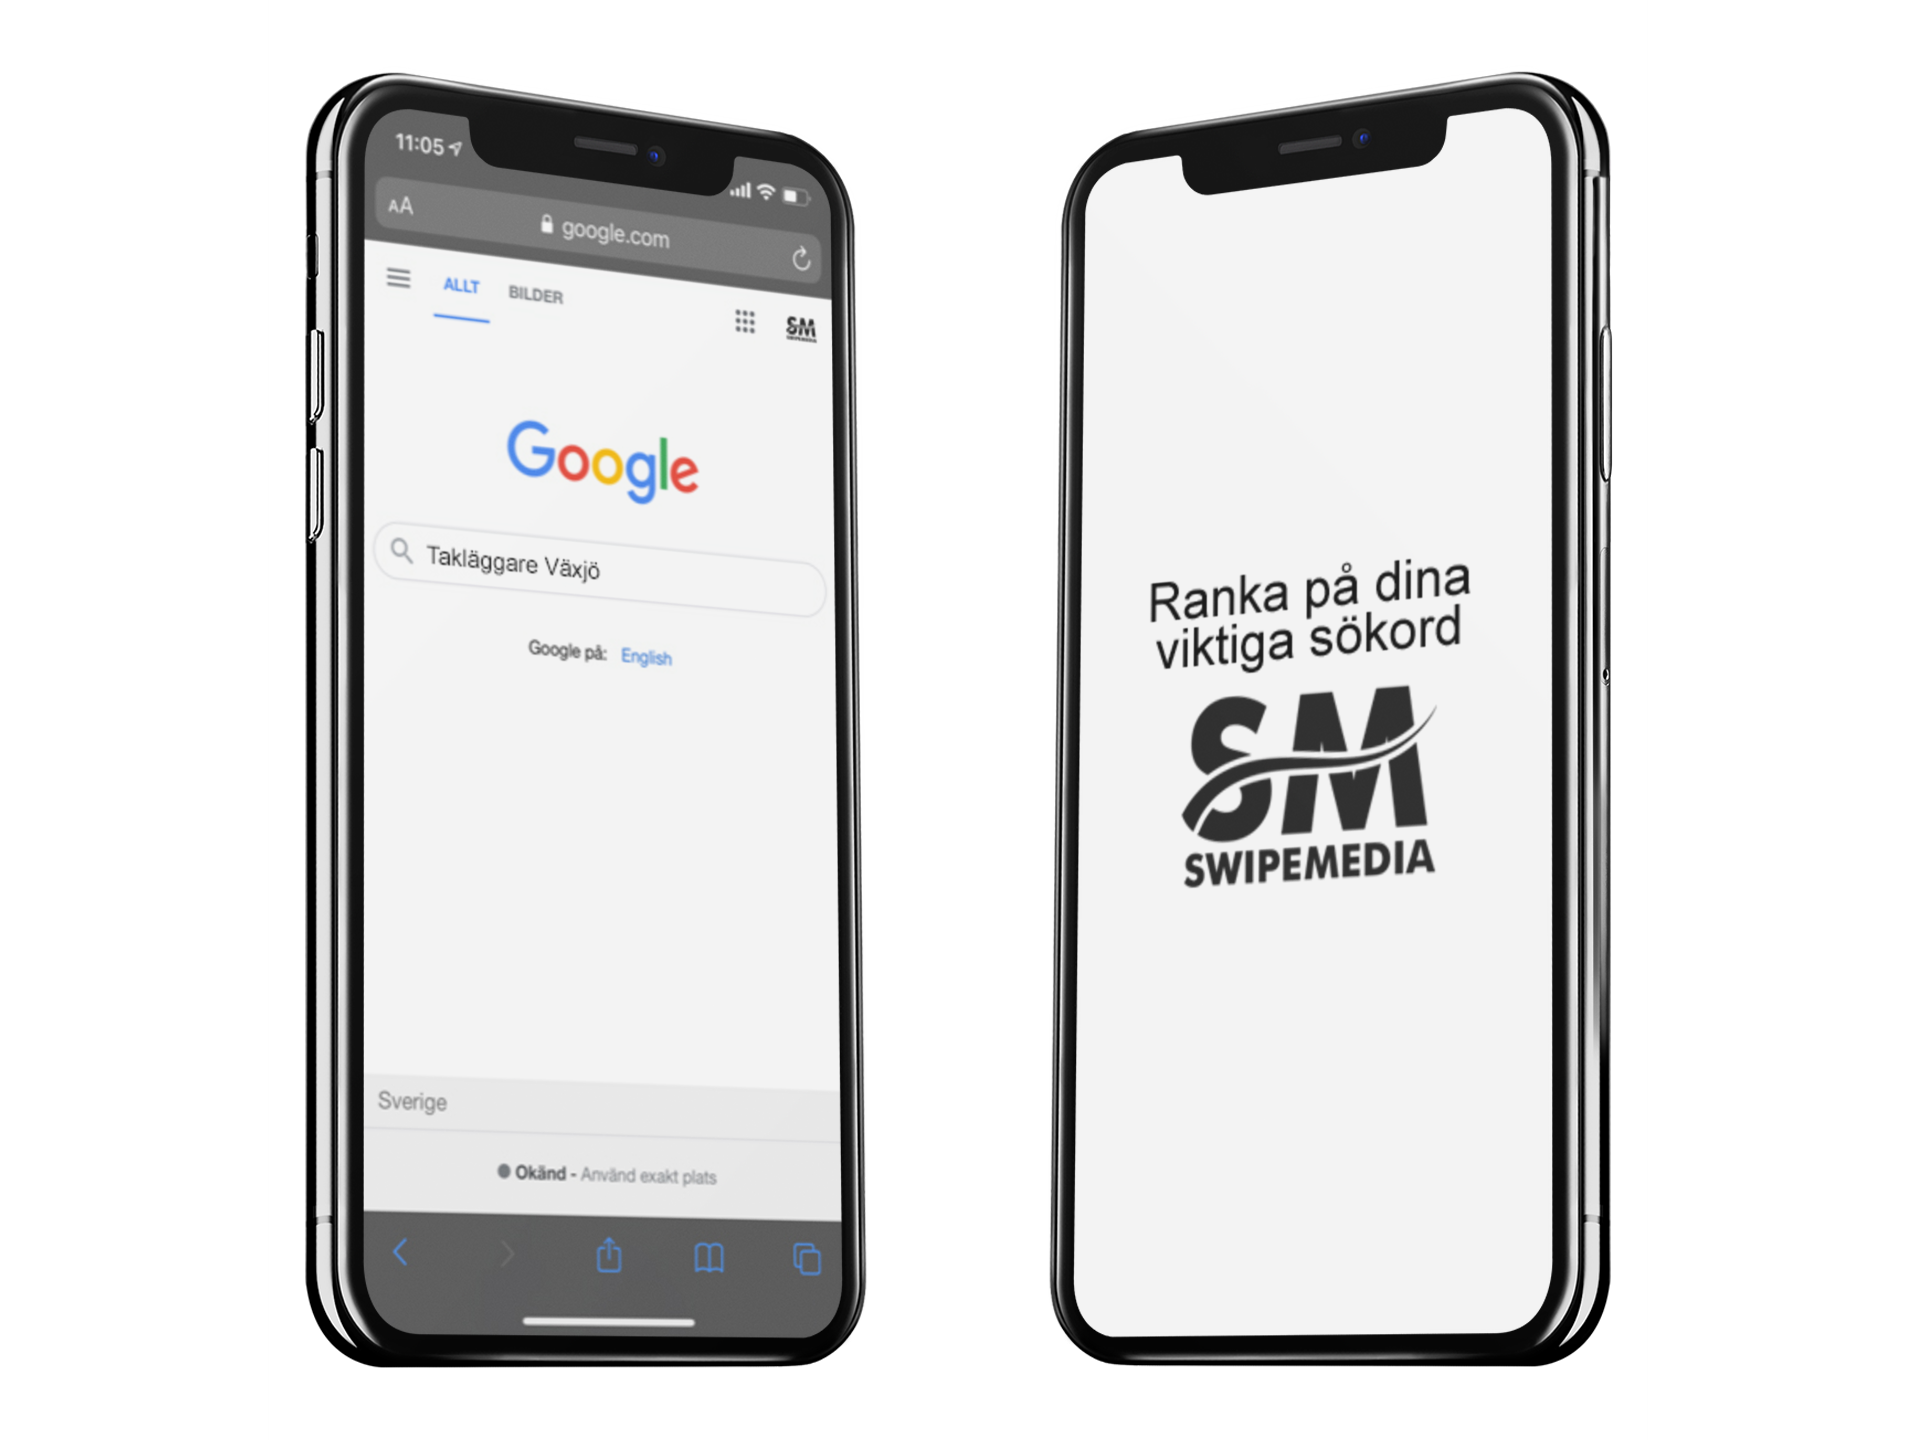 Mobiler som söker på Google